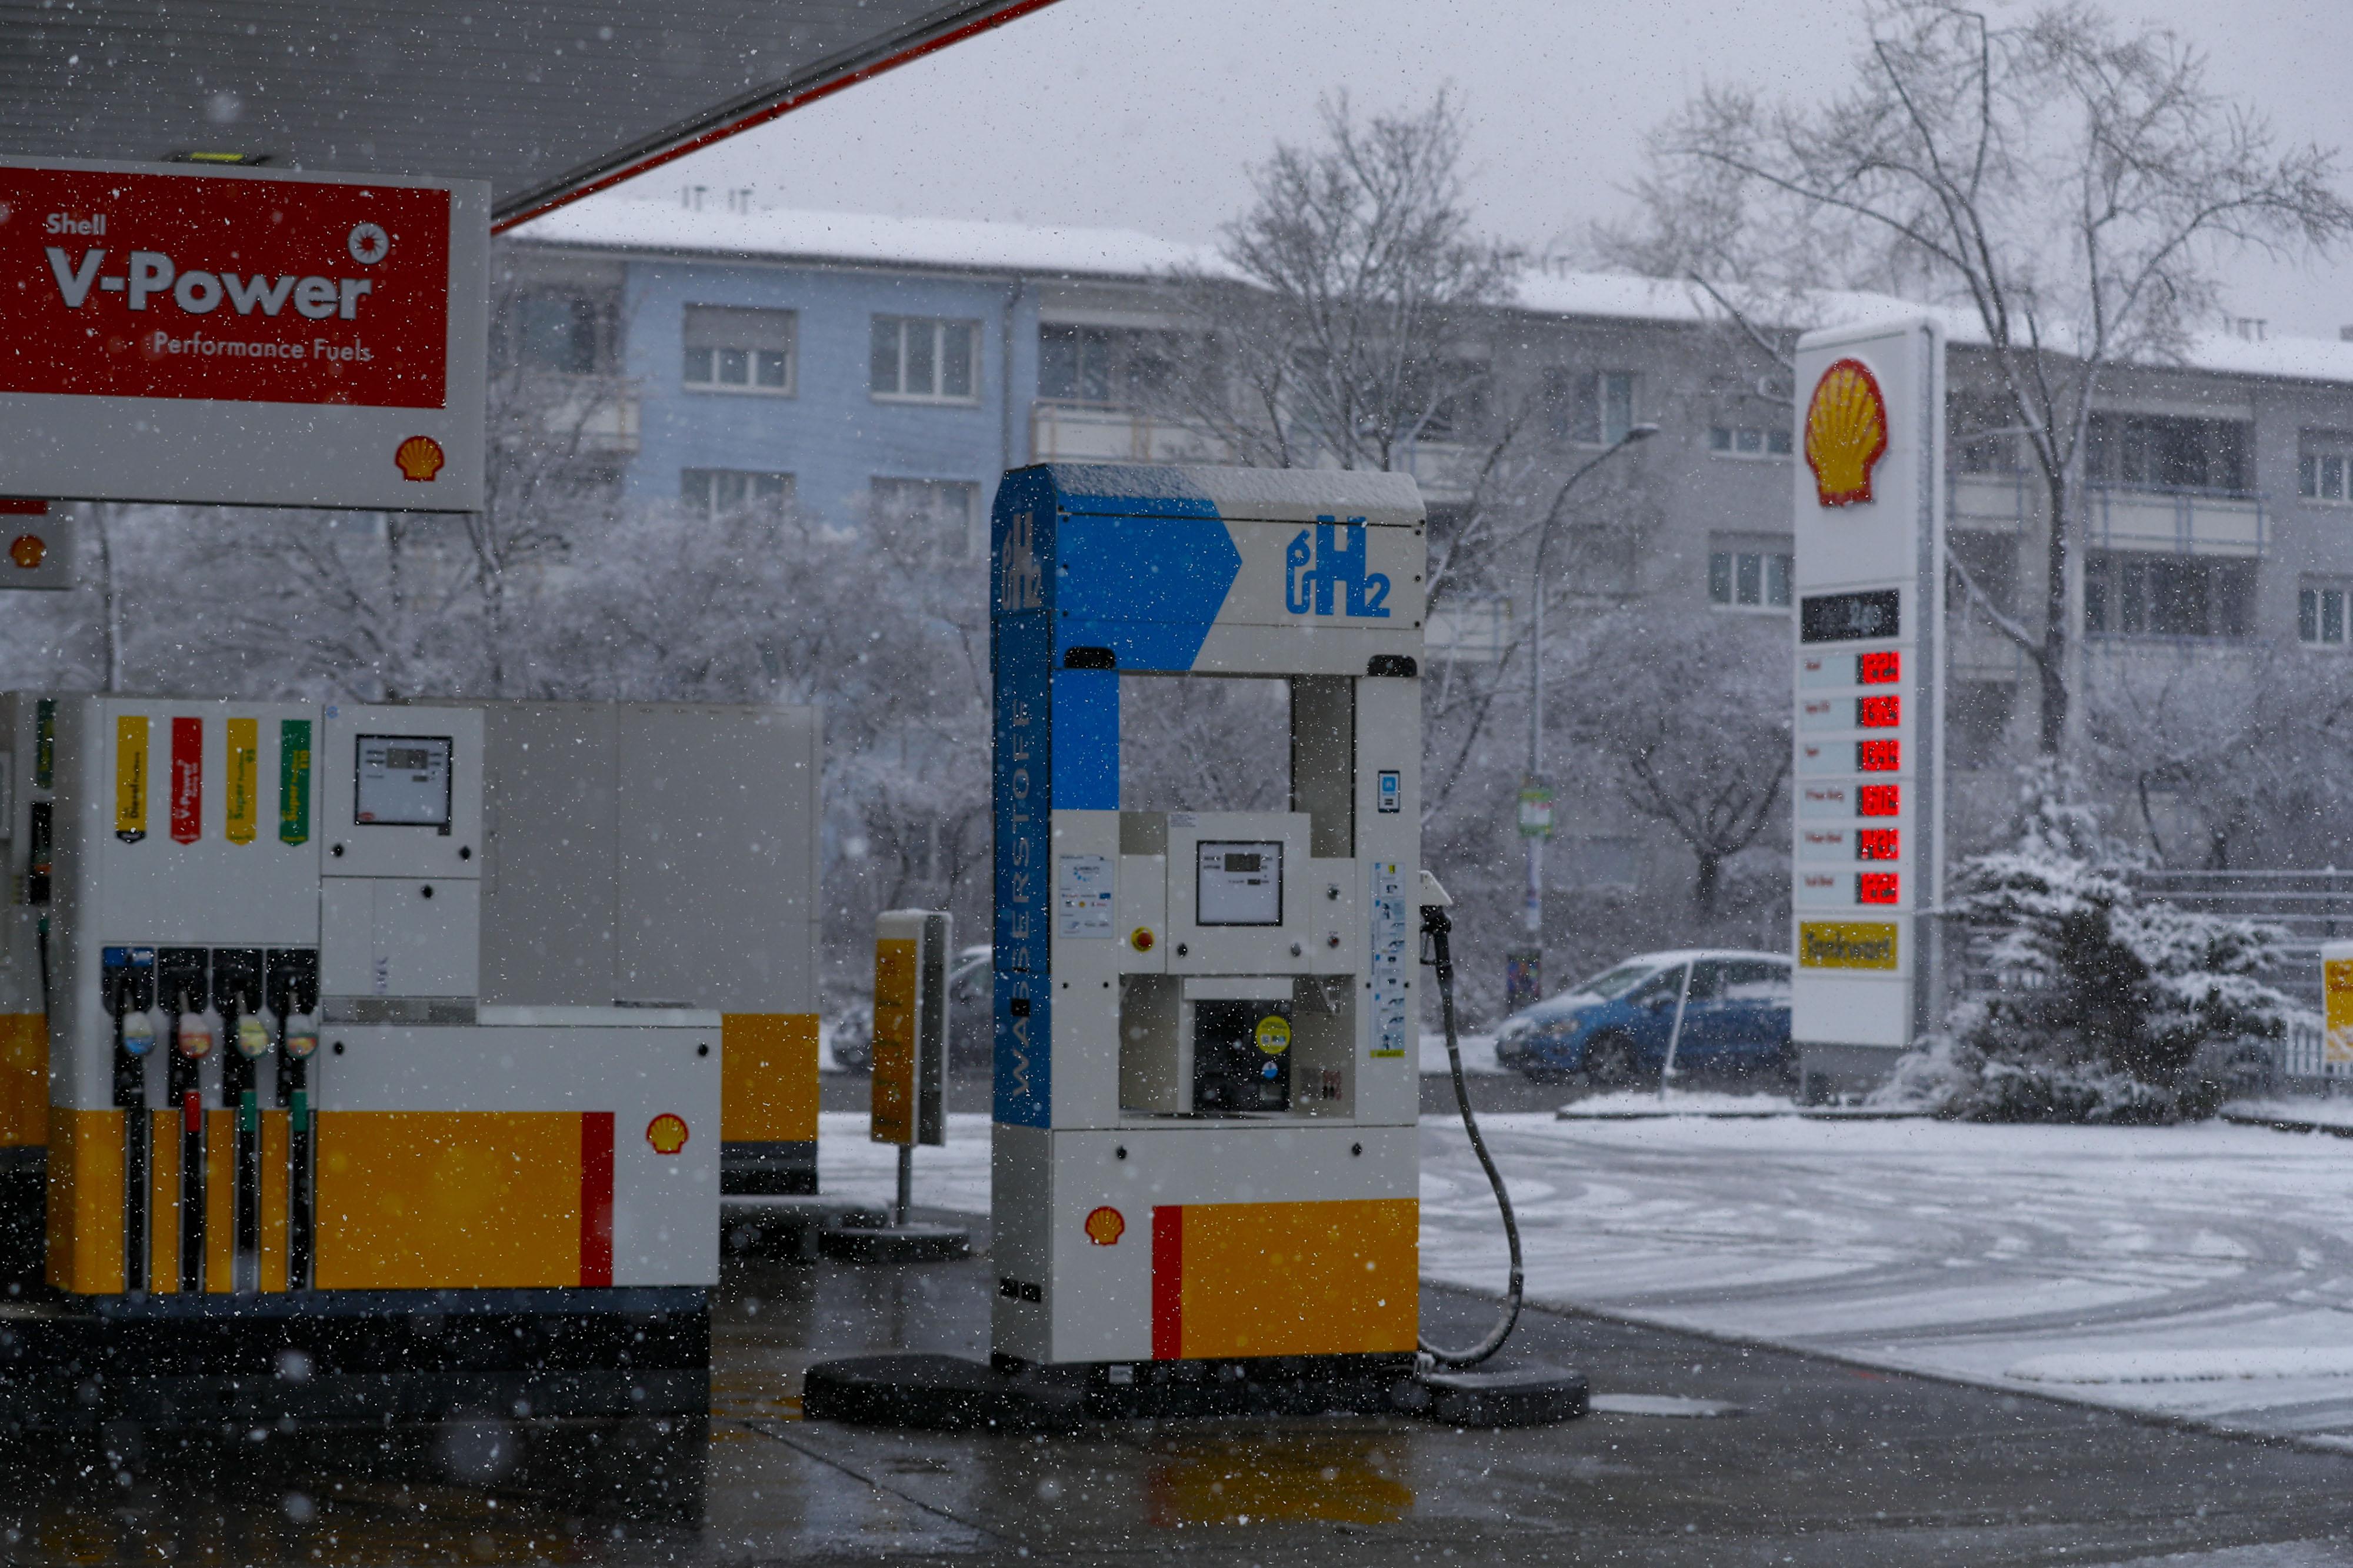 A hydrogen fuel pump stands on the forecourt of a Royal Dutch Shellgas station in Sindelfingen, GermanyonFeb. 26, 2020.